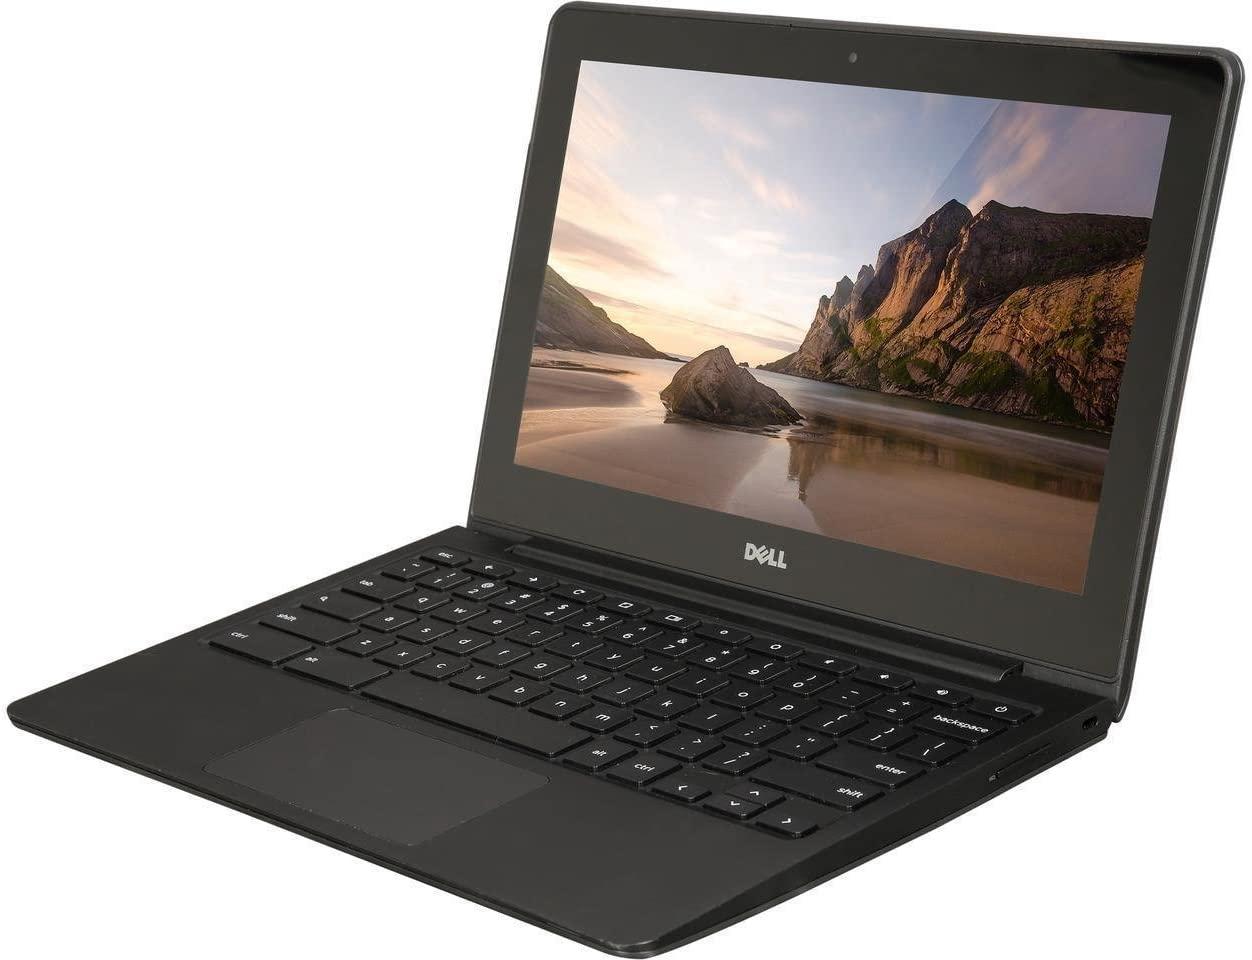 best budget laptops under 500 9 image